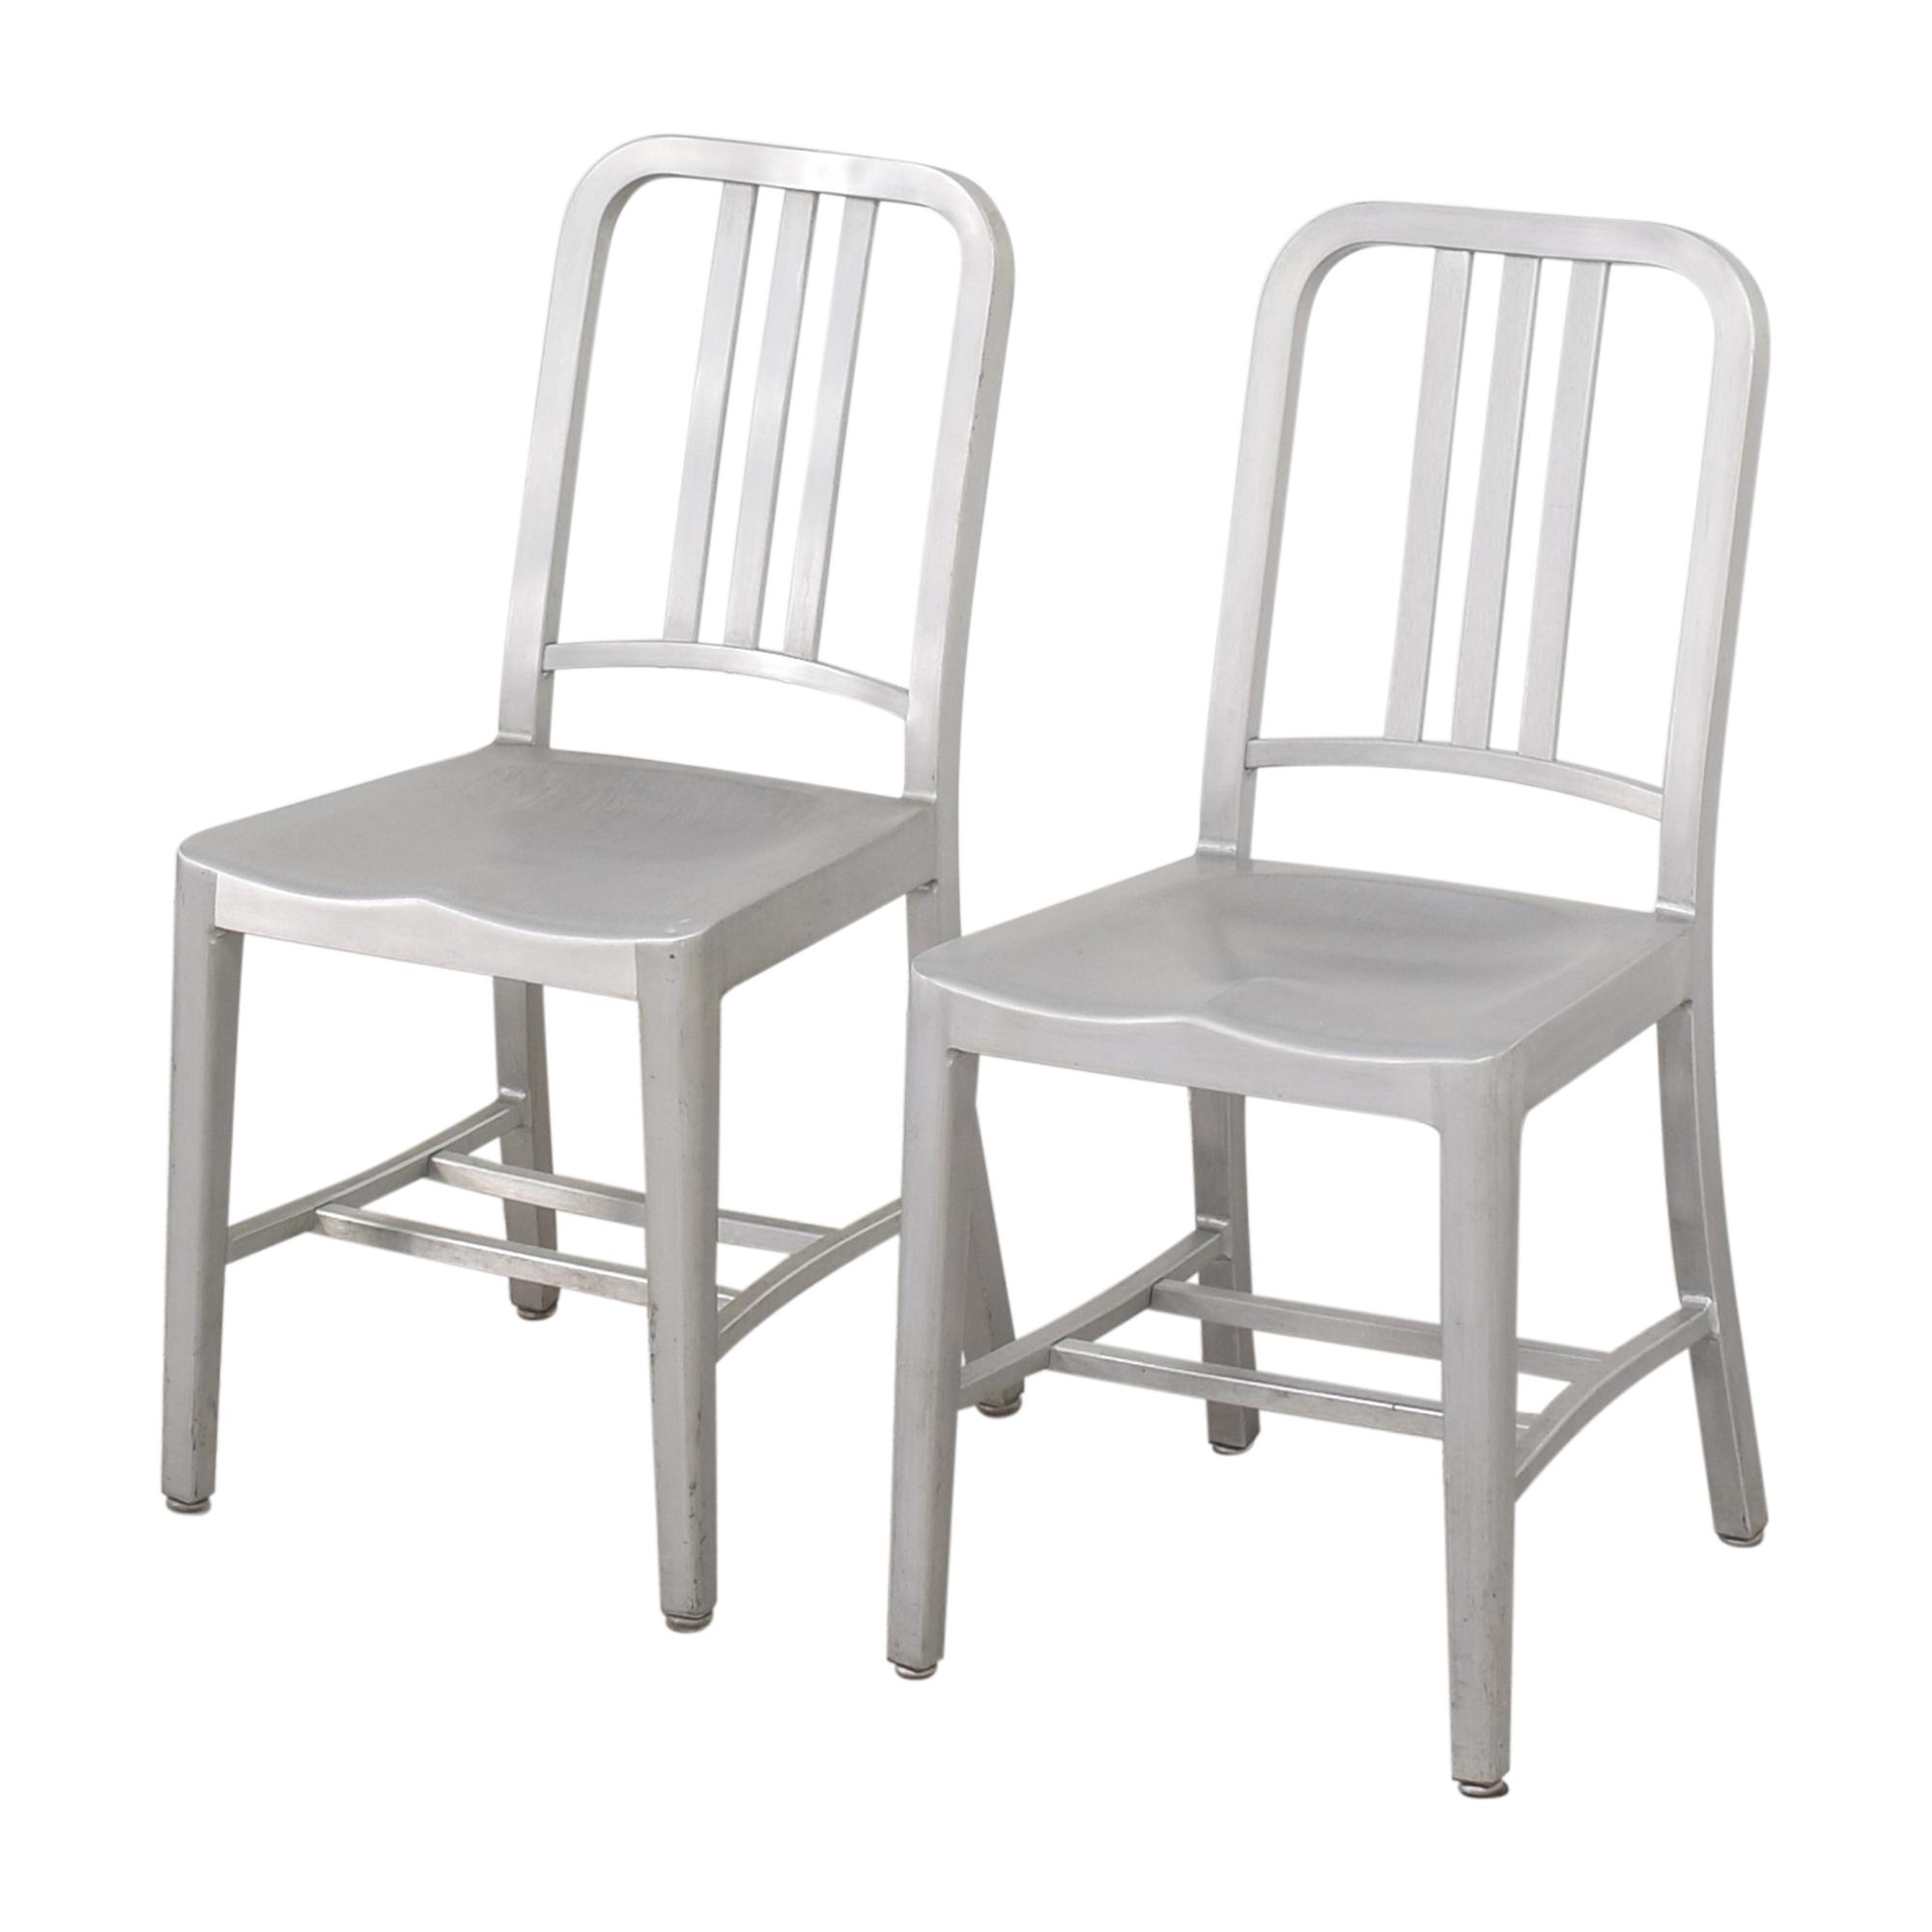 Emeco Emeco Navy Chairs ma